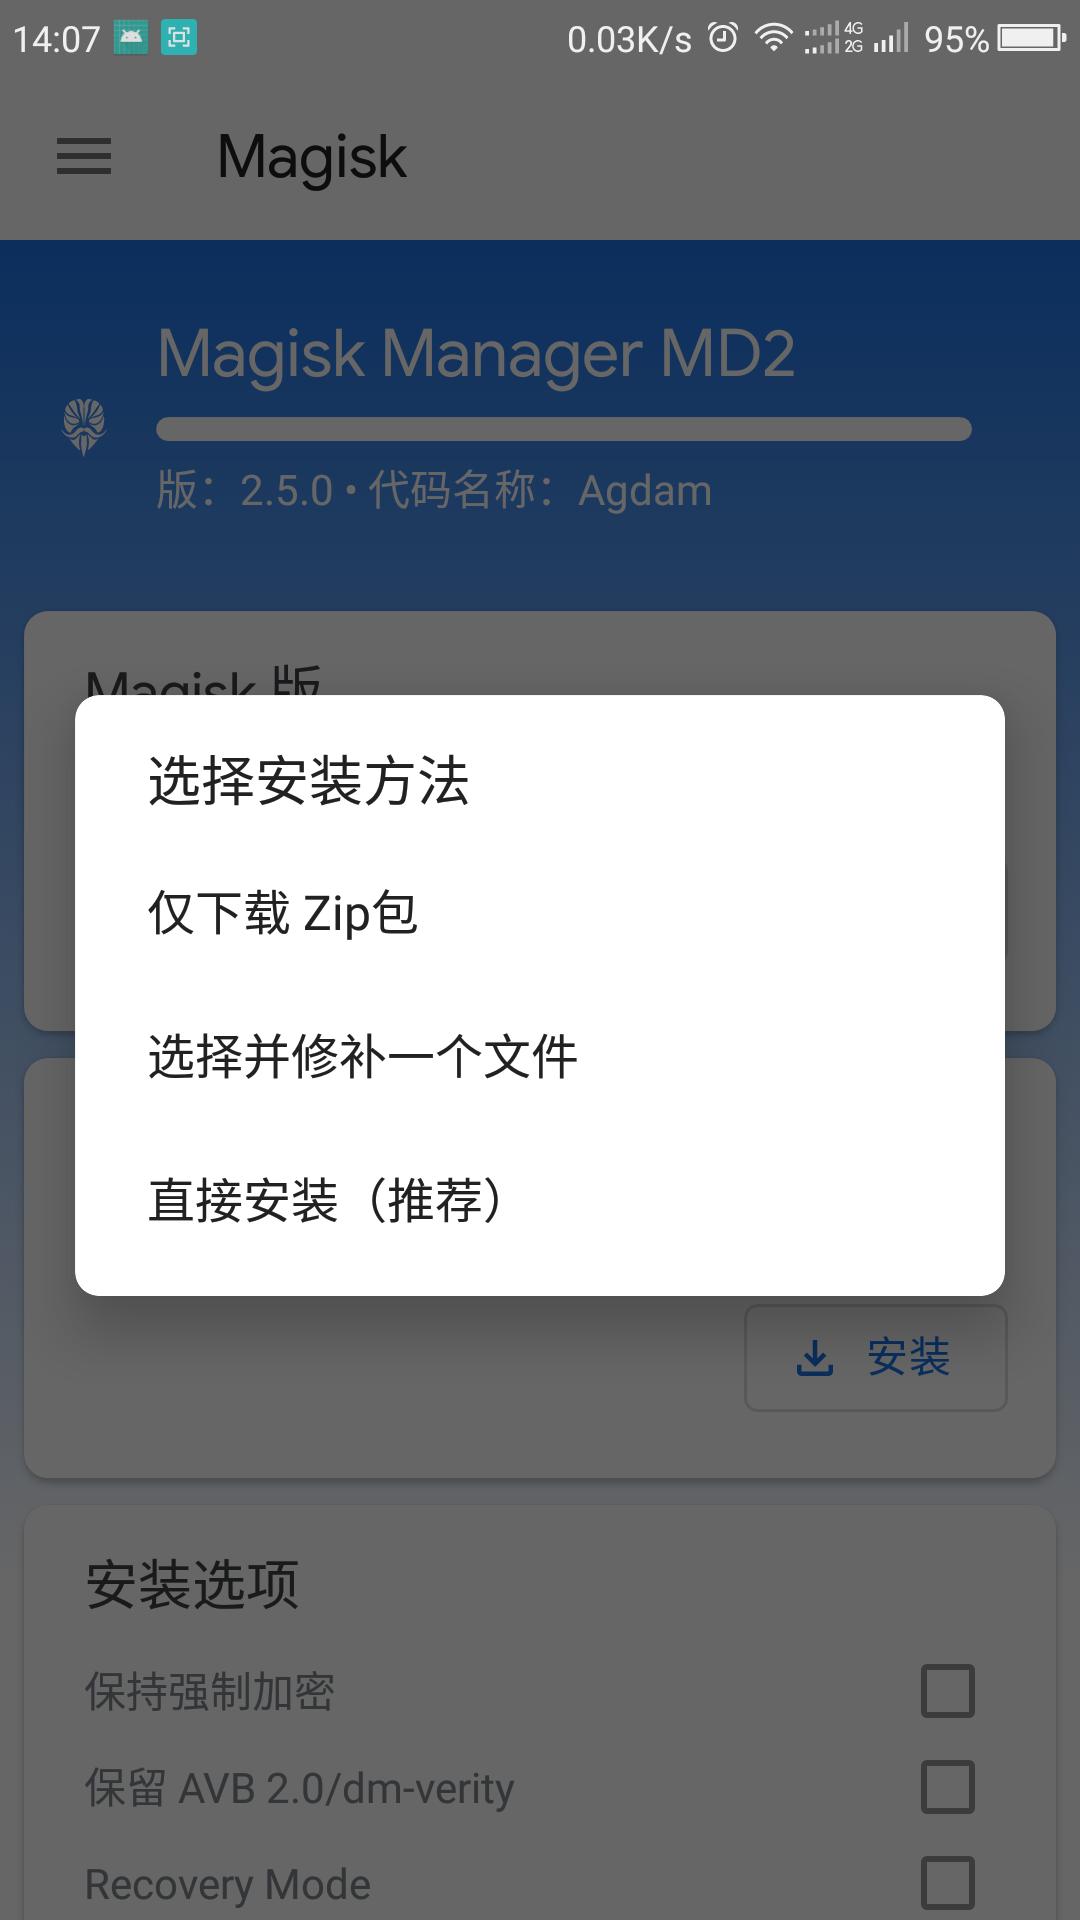 Screenshot_2019-10-03-14-07-40.png